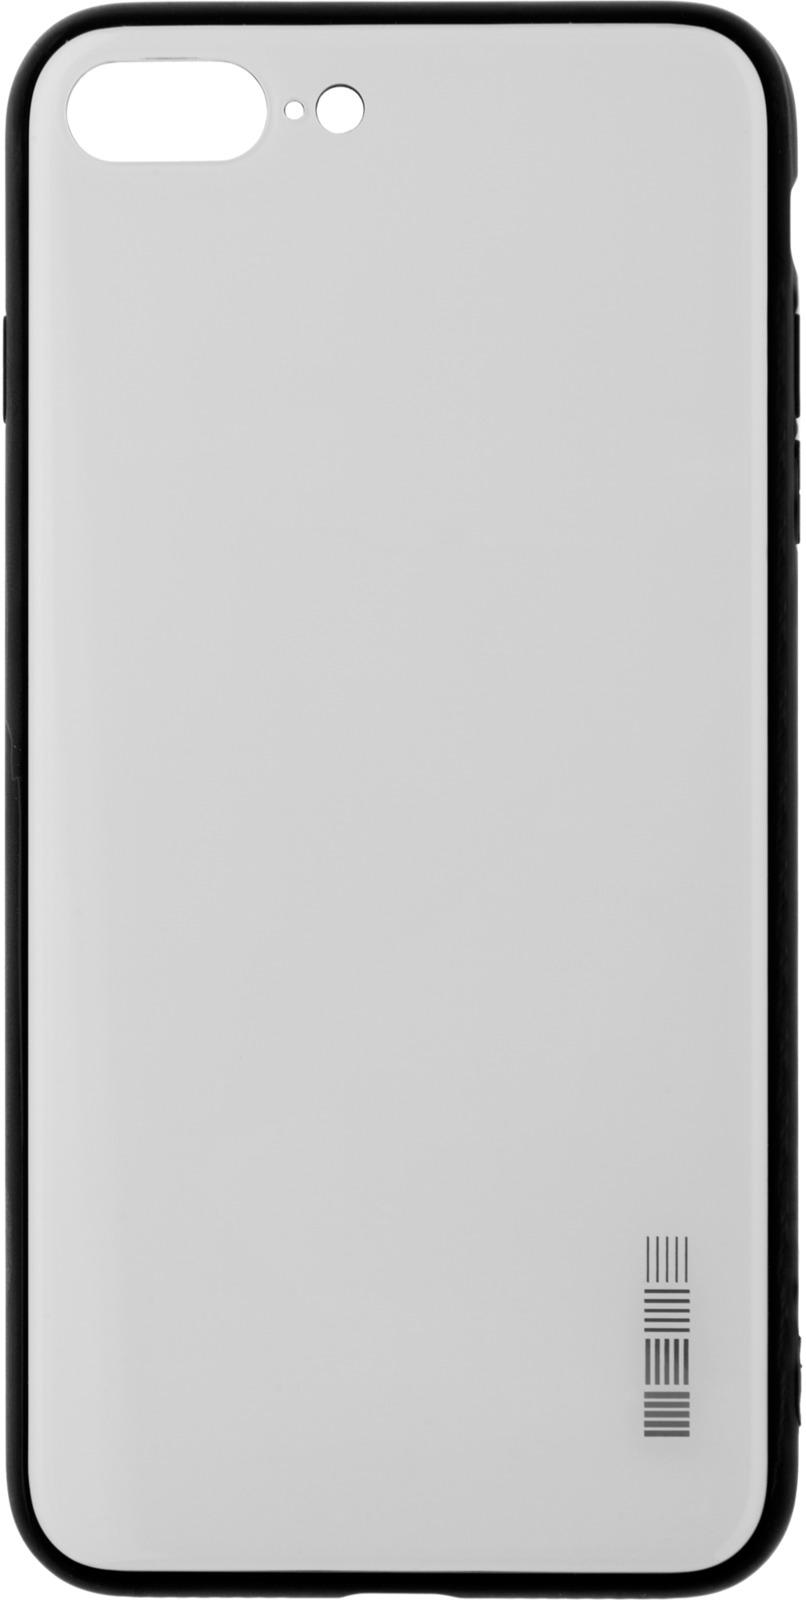 Чехол-накладка Interstep Is Glass для Apple iPhone 7/8 Plus, White чехол накладка interstep is bloom для apple iphone 7 8 plus turquoise